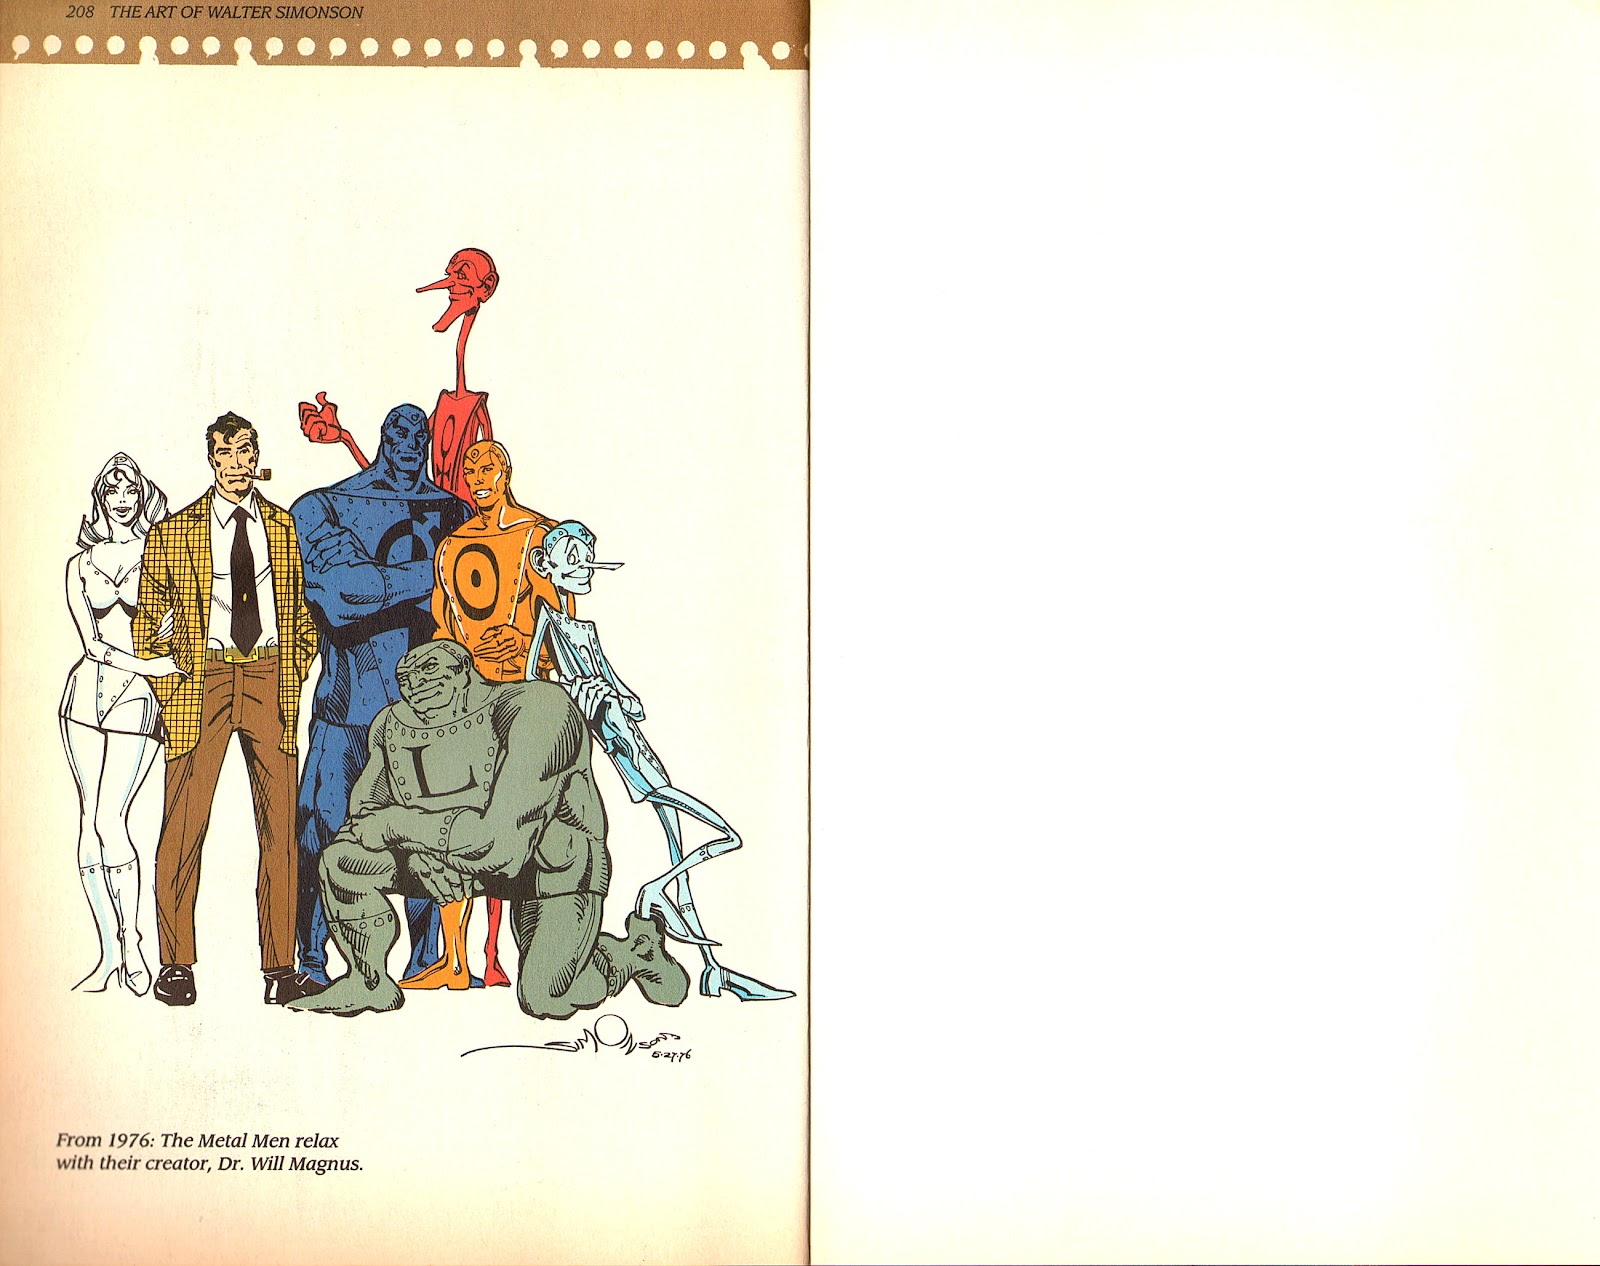 Read online The Art of Walter Simonson comic -  Issue # TPB - 106